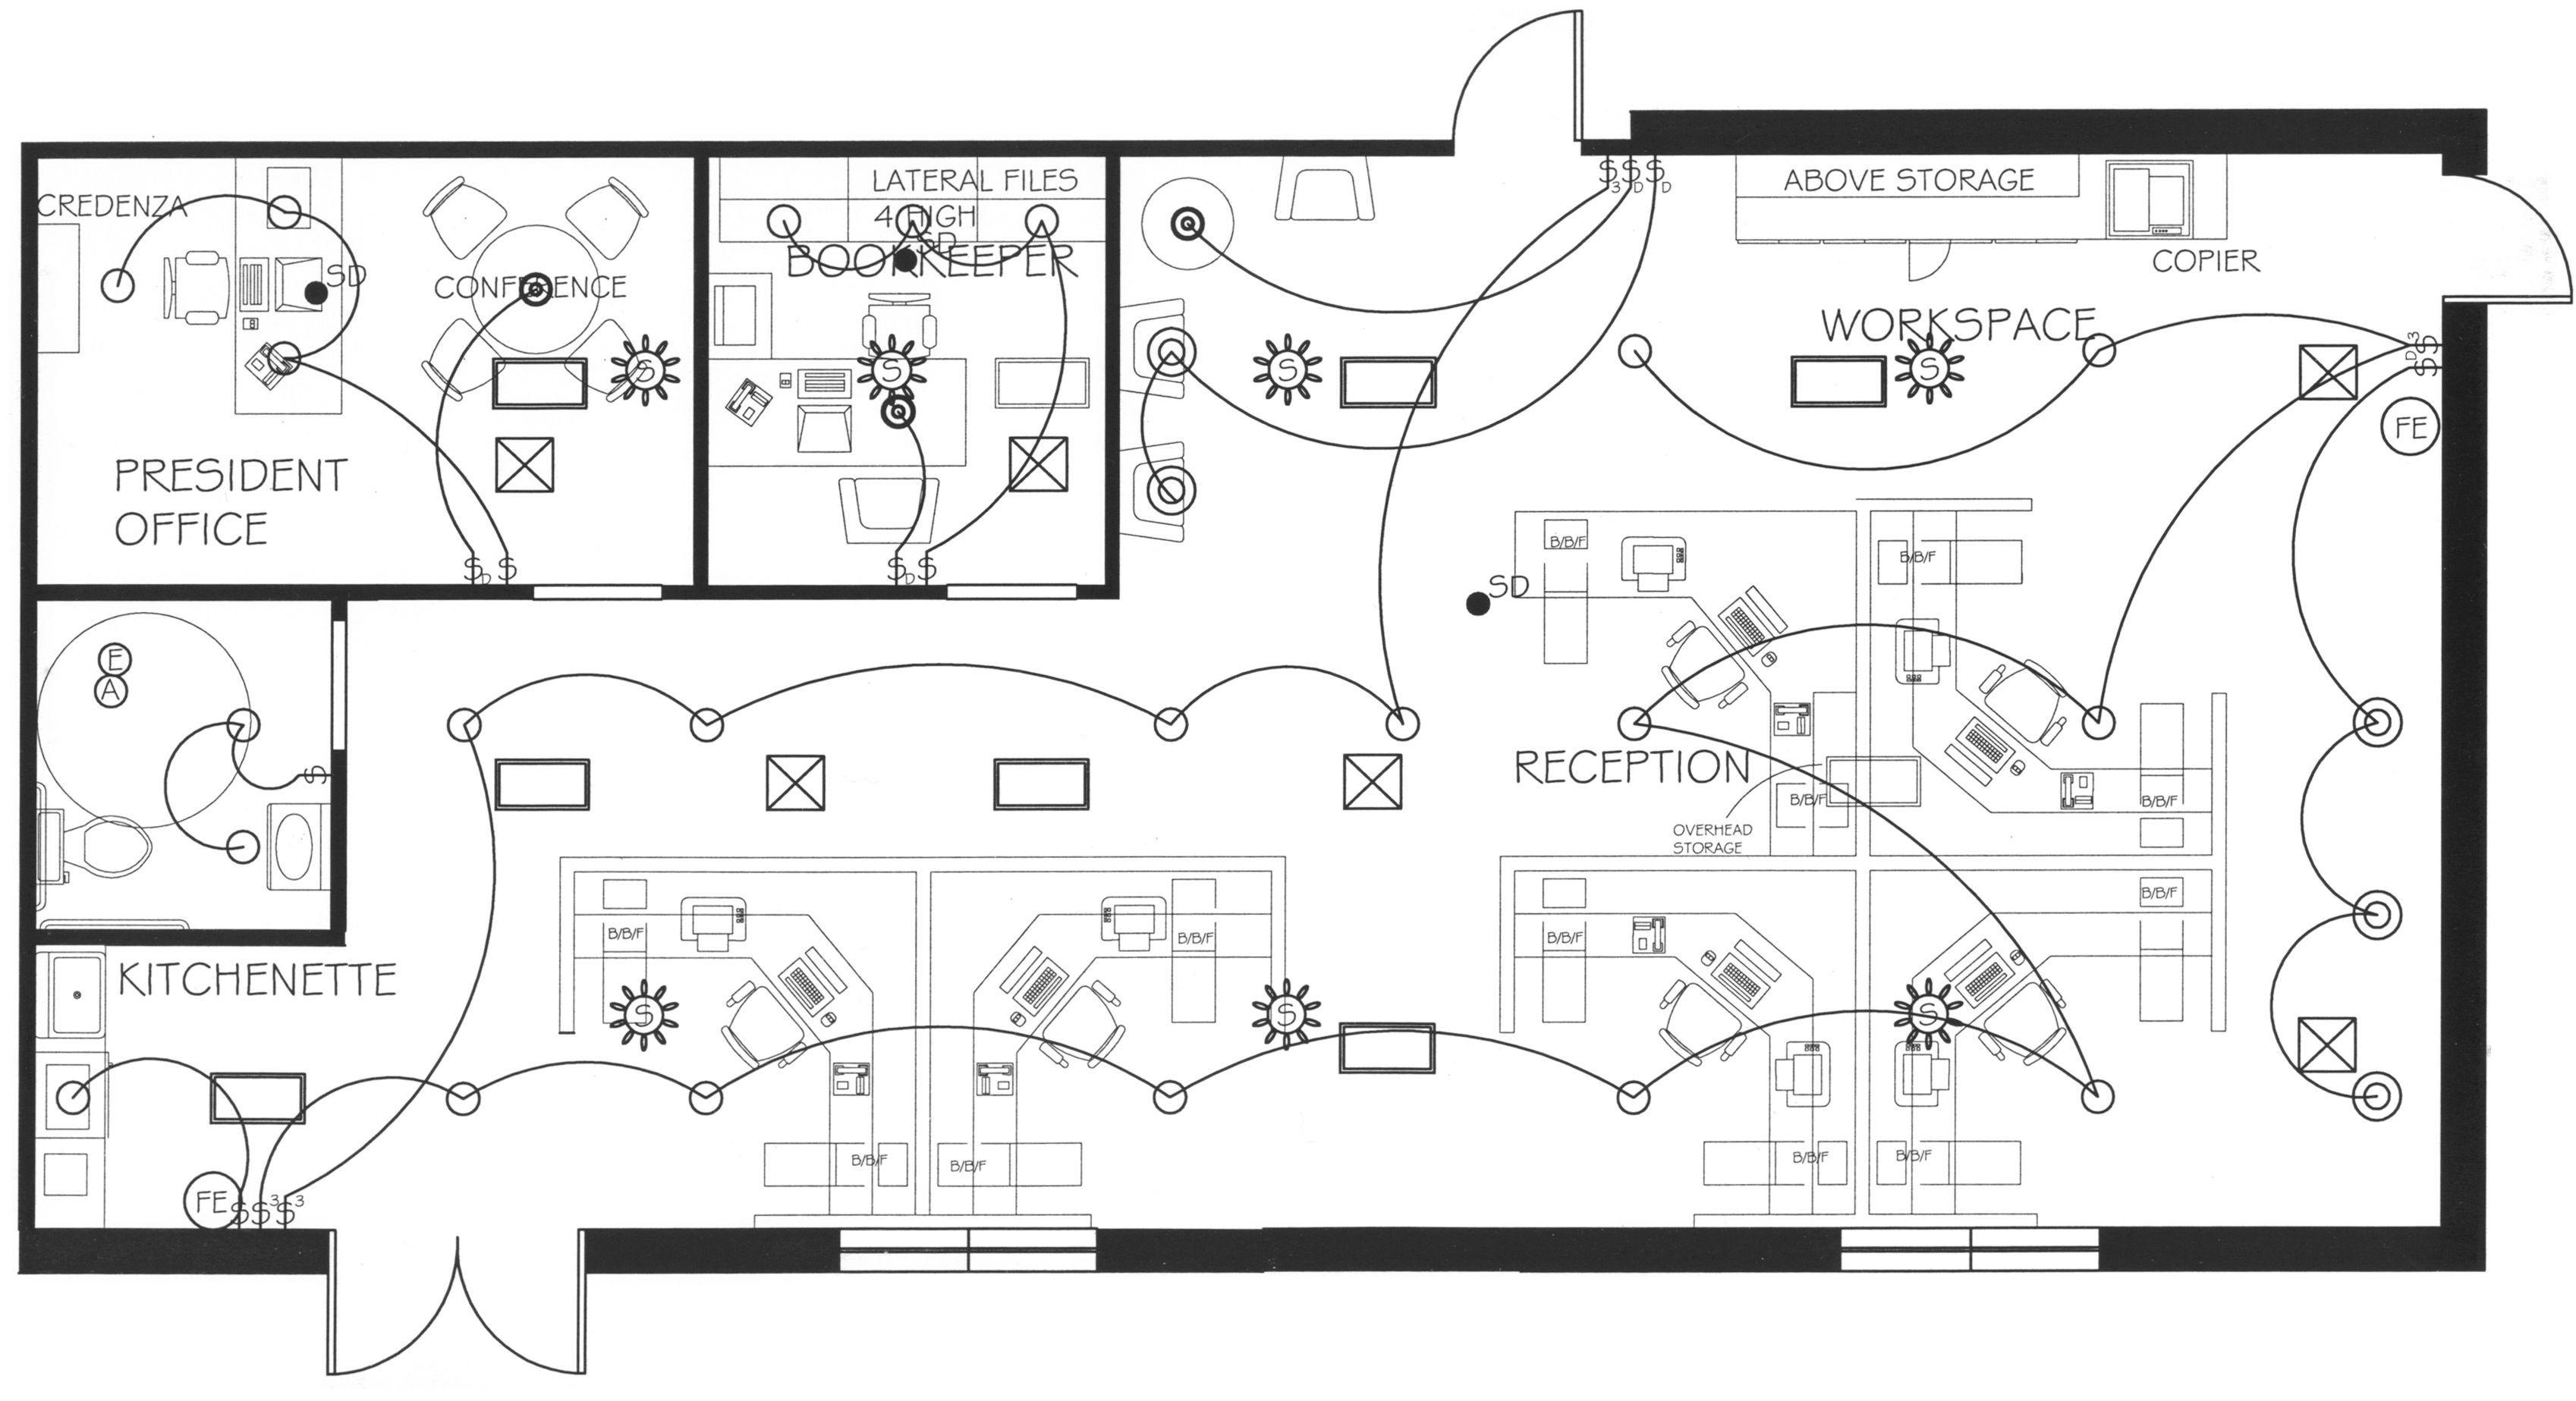 hight resolution of new electrical floor plan sample diagram wiringdiagram diagramming diagramm visuals